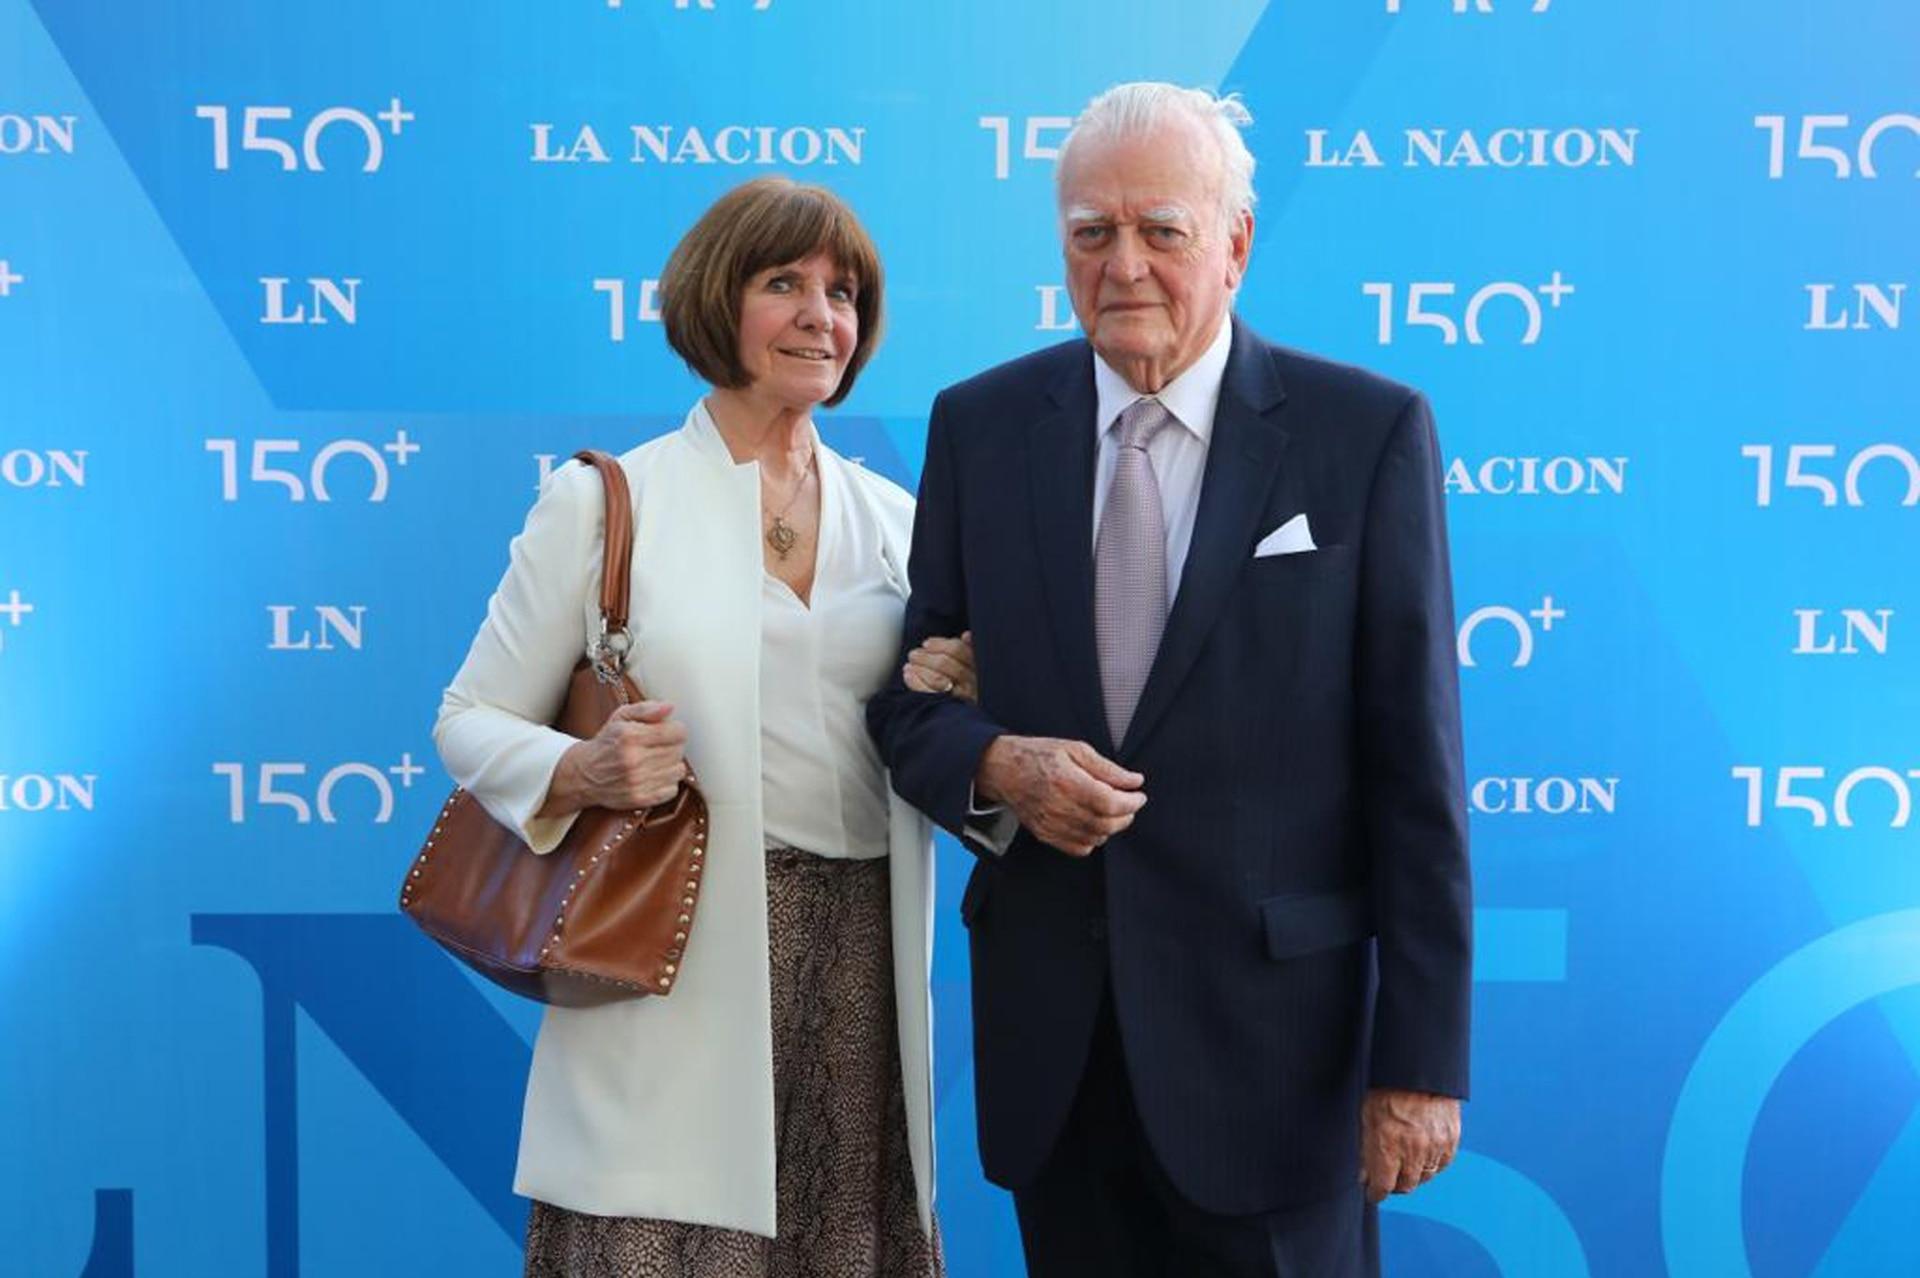 Alberto Gowland Mitre junto a su esposa